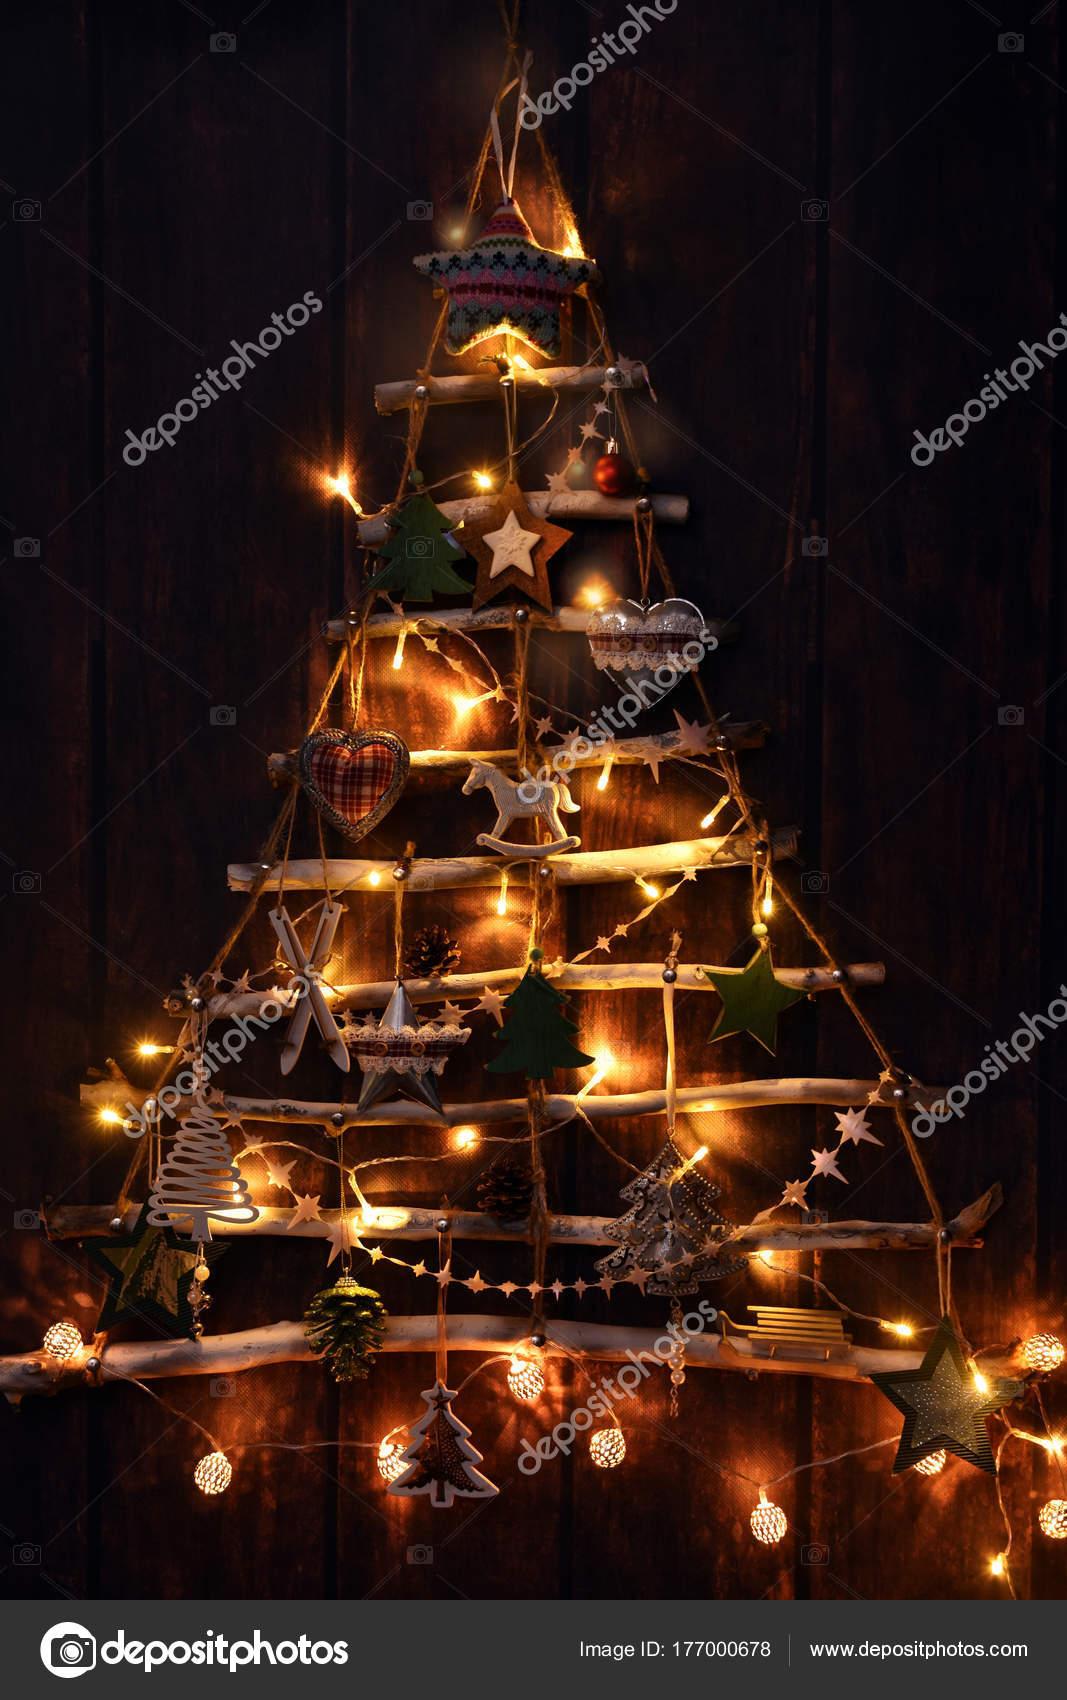 Creative Handmade Christmas Tree Illuminated In The Dark Stock Photo